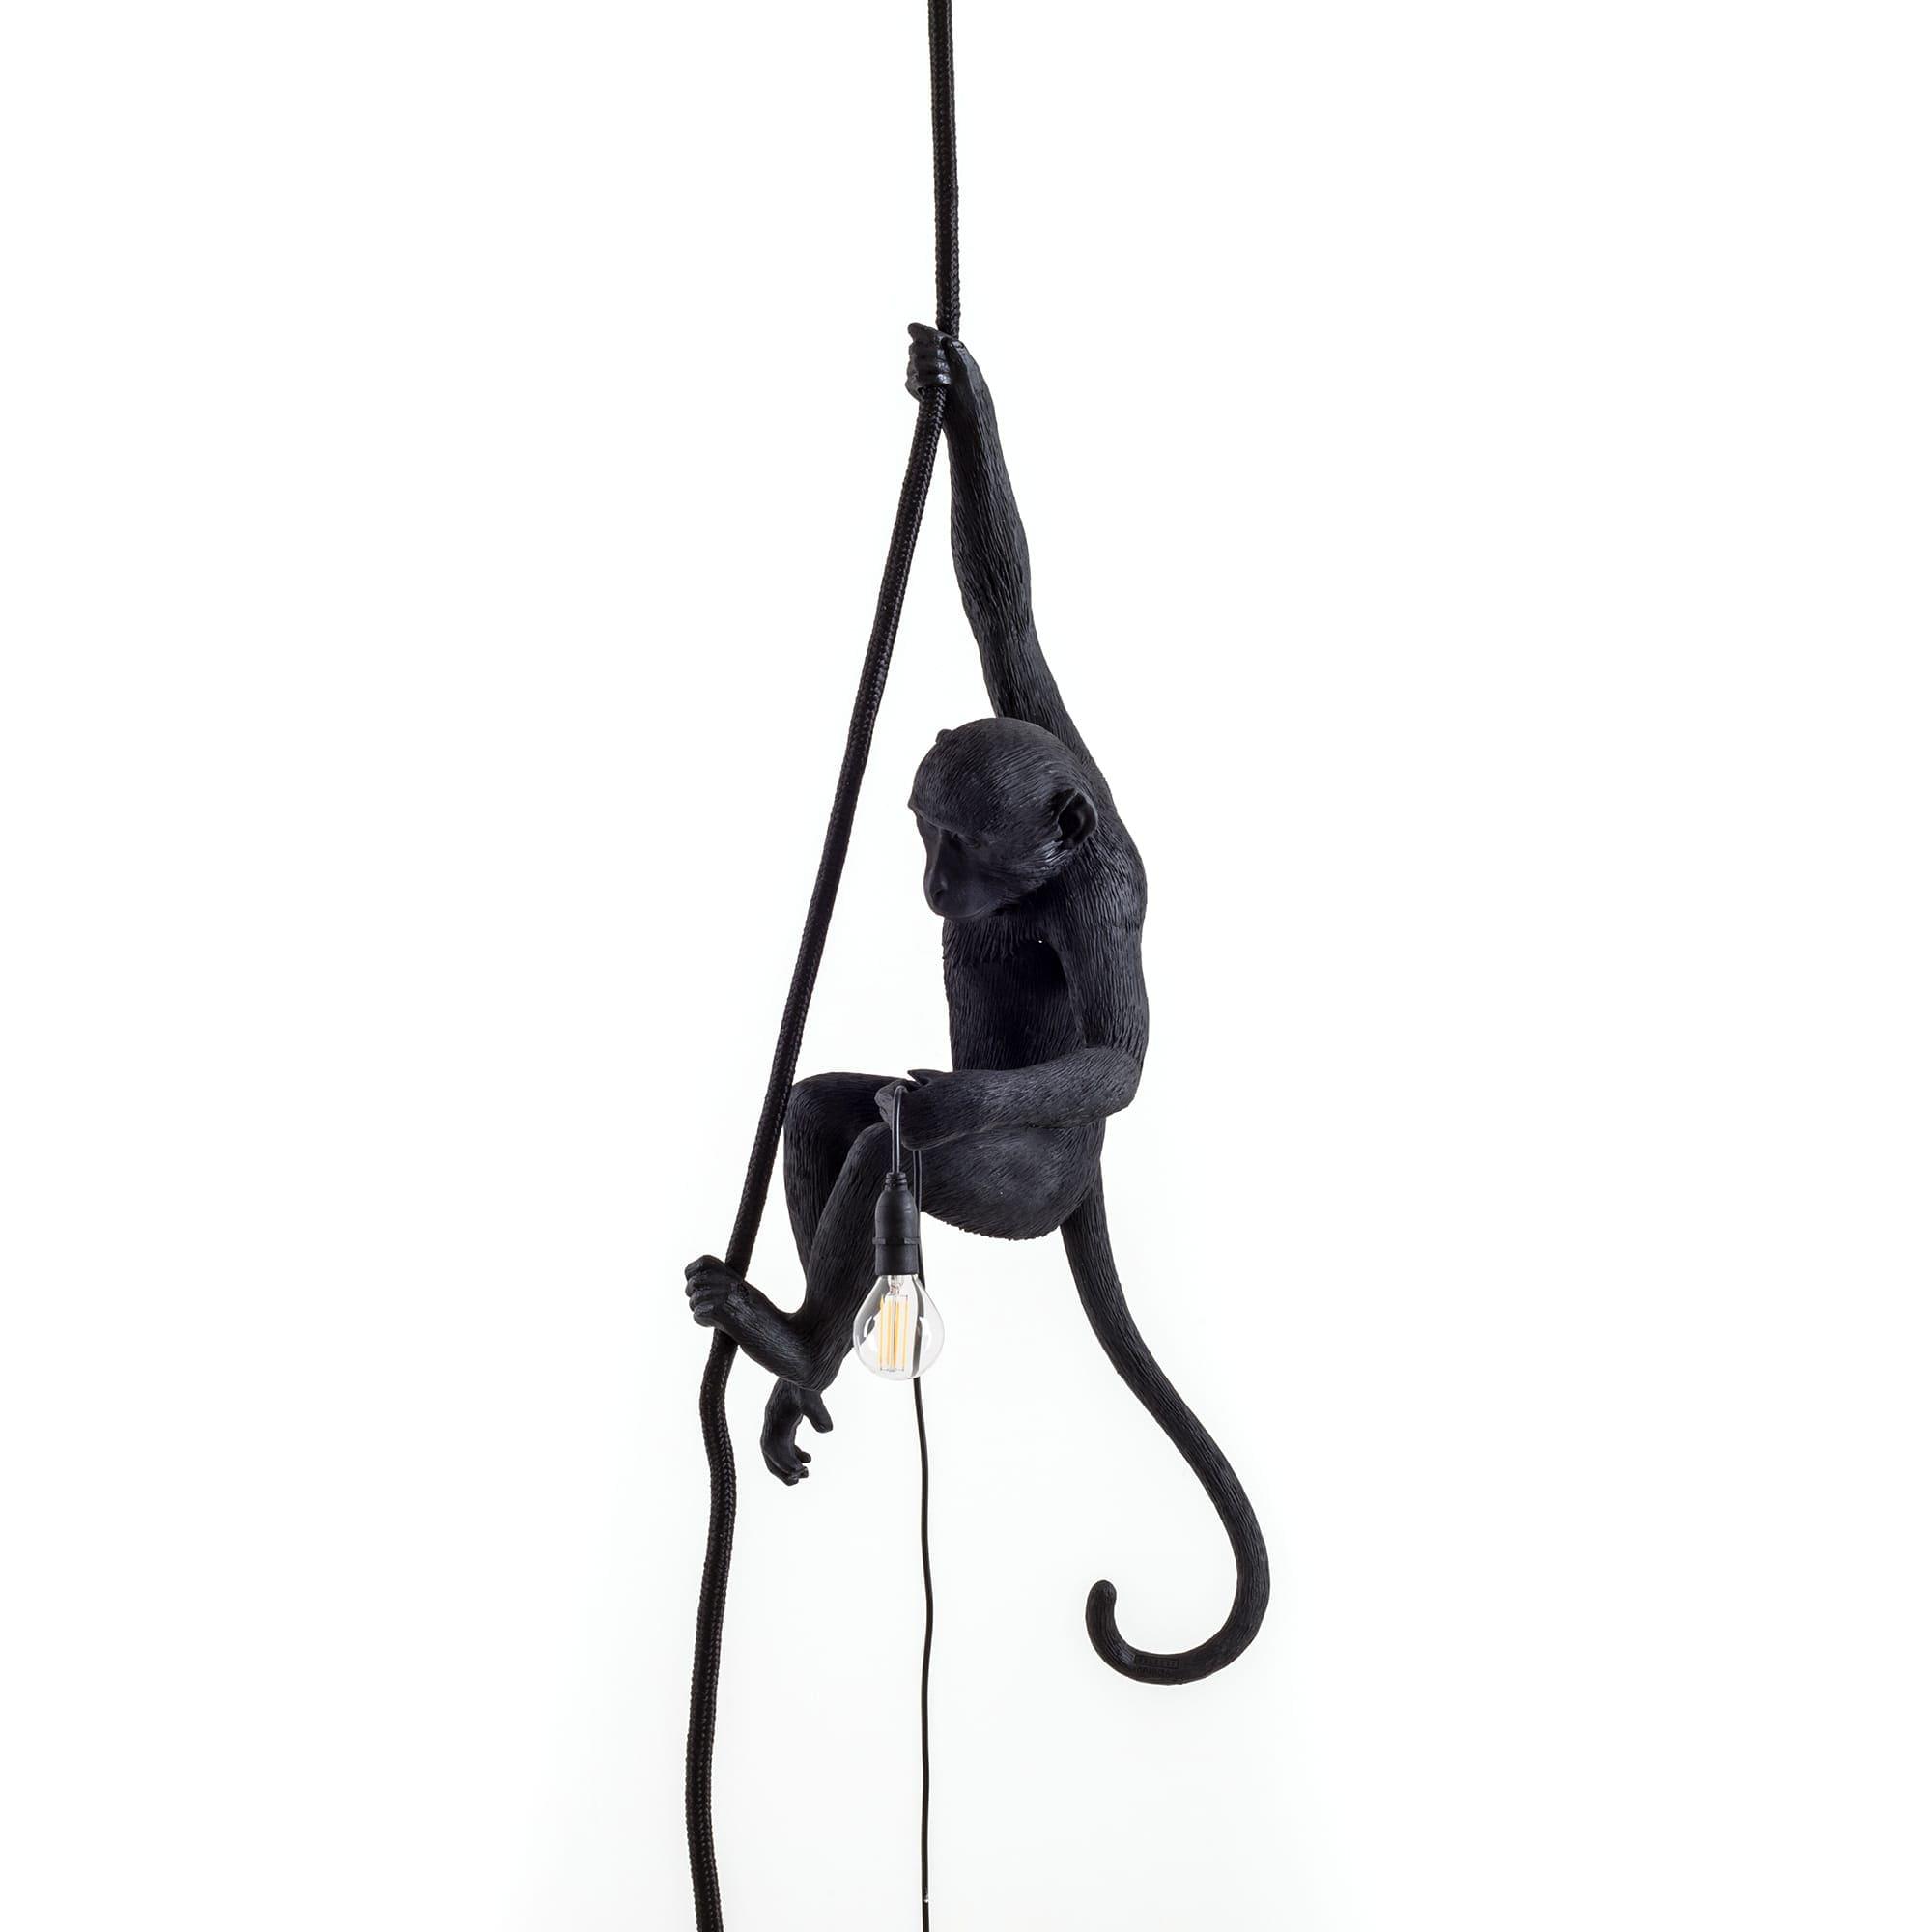 Monkey Lamp Outdoor Lyspære, LED Seletti @ RoyalDesign.no